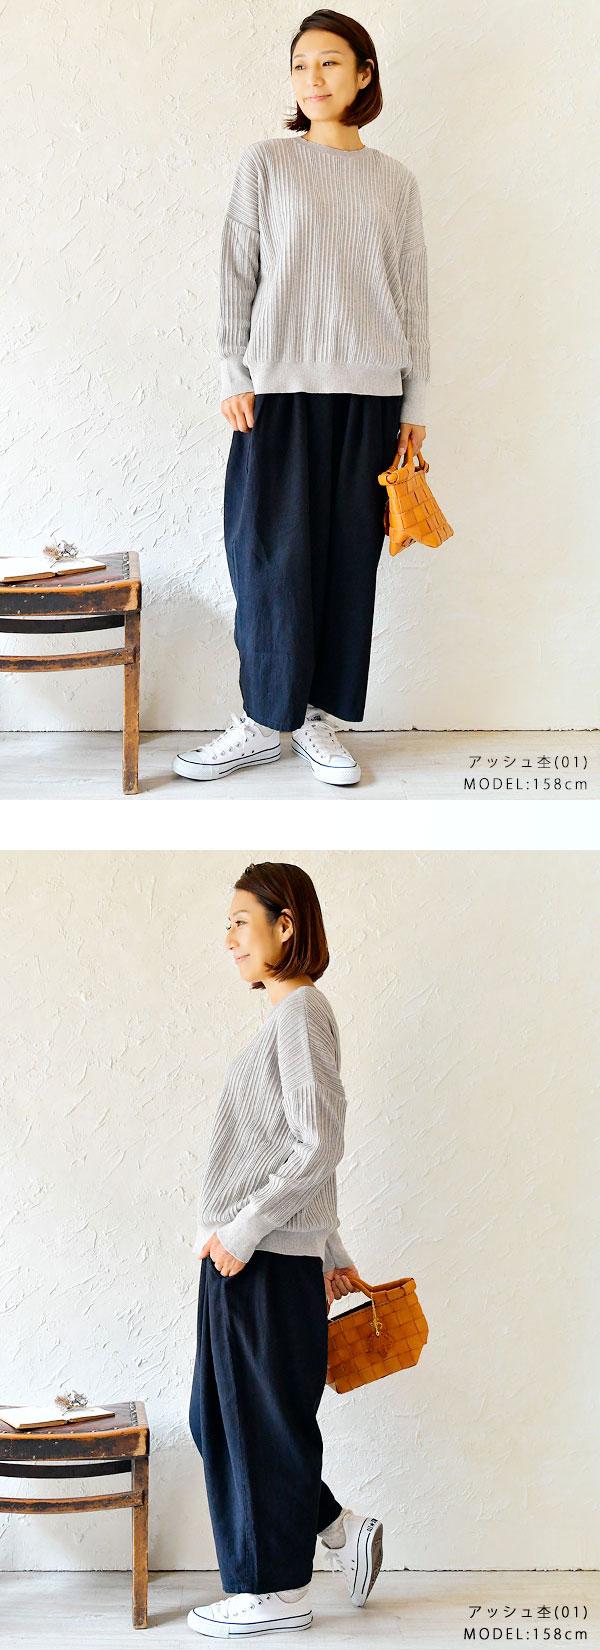 【NARU ナル】コットン 天竺 ワイド プルオーバー カットソー(630700)